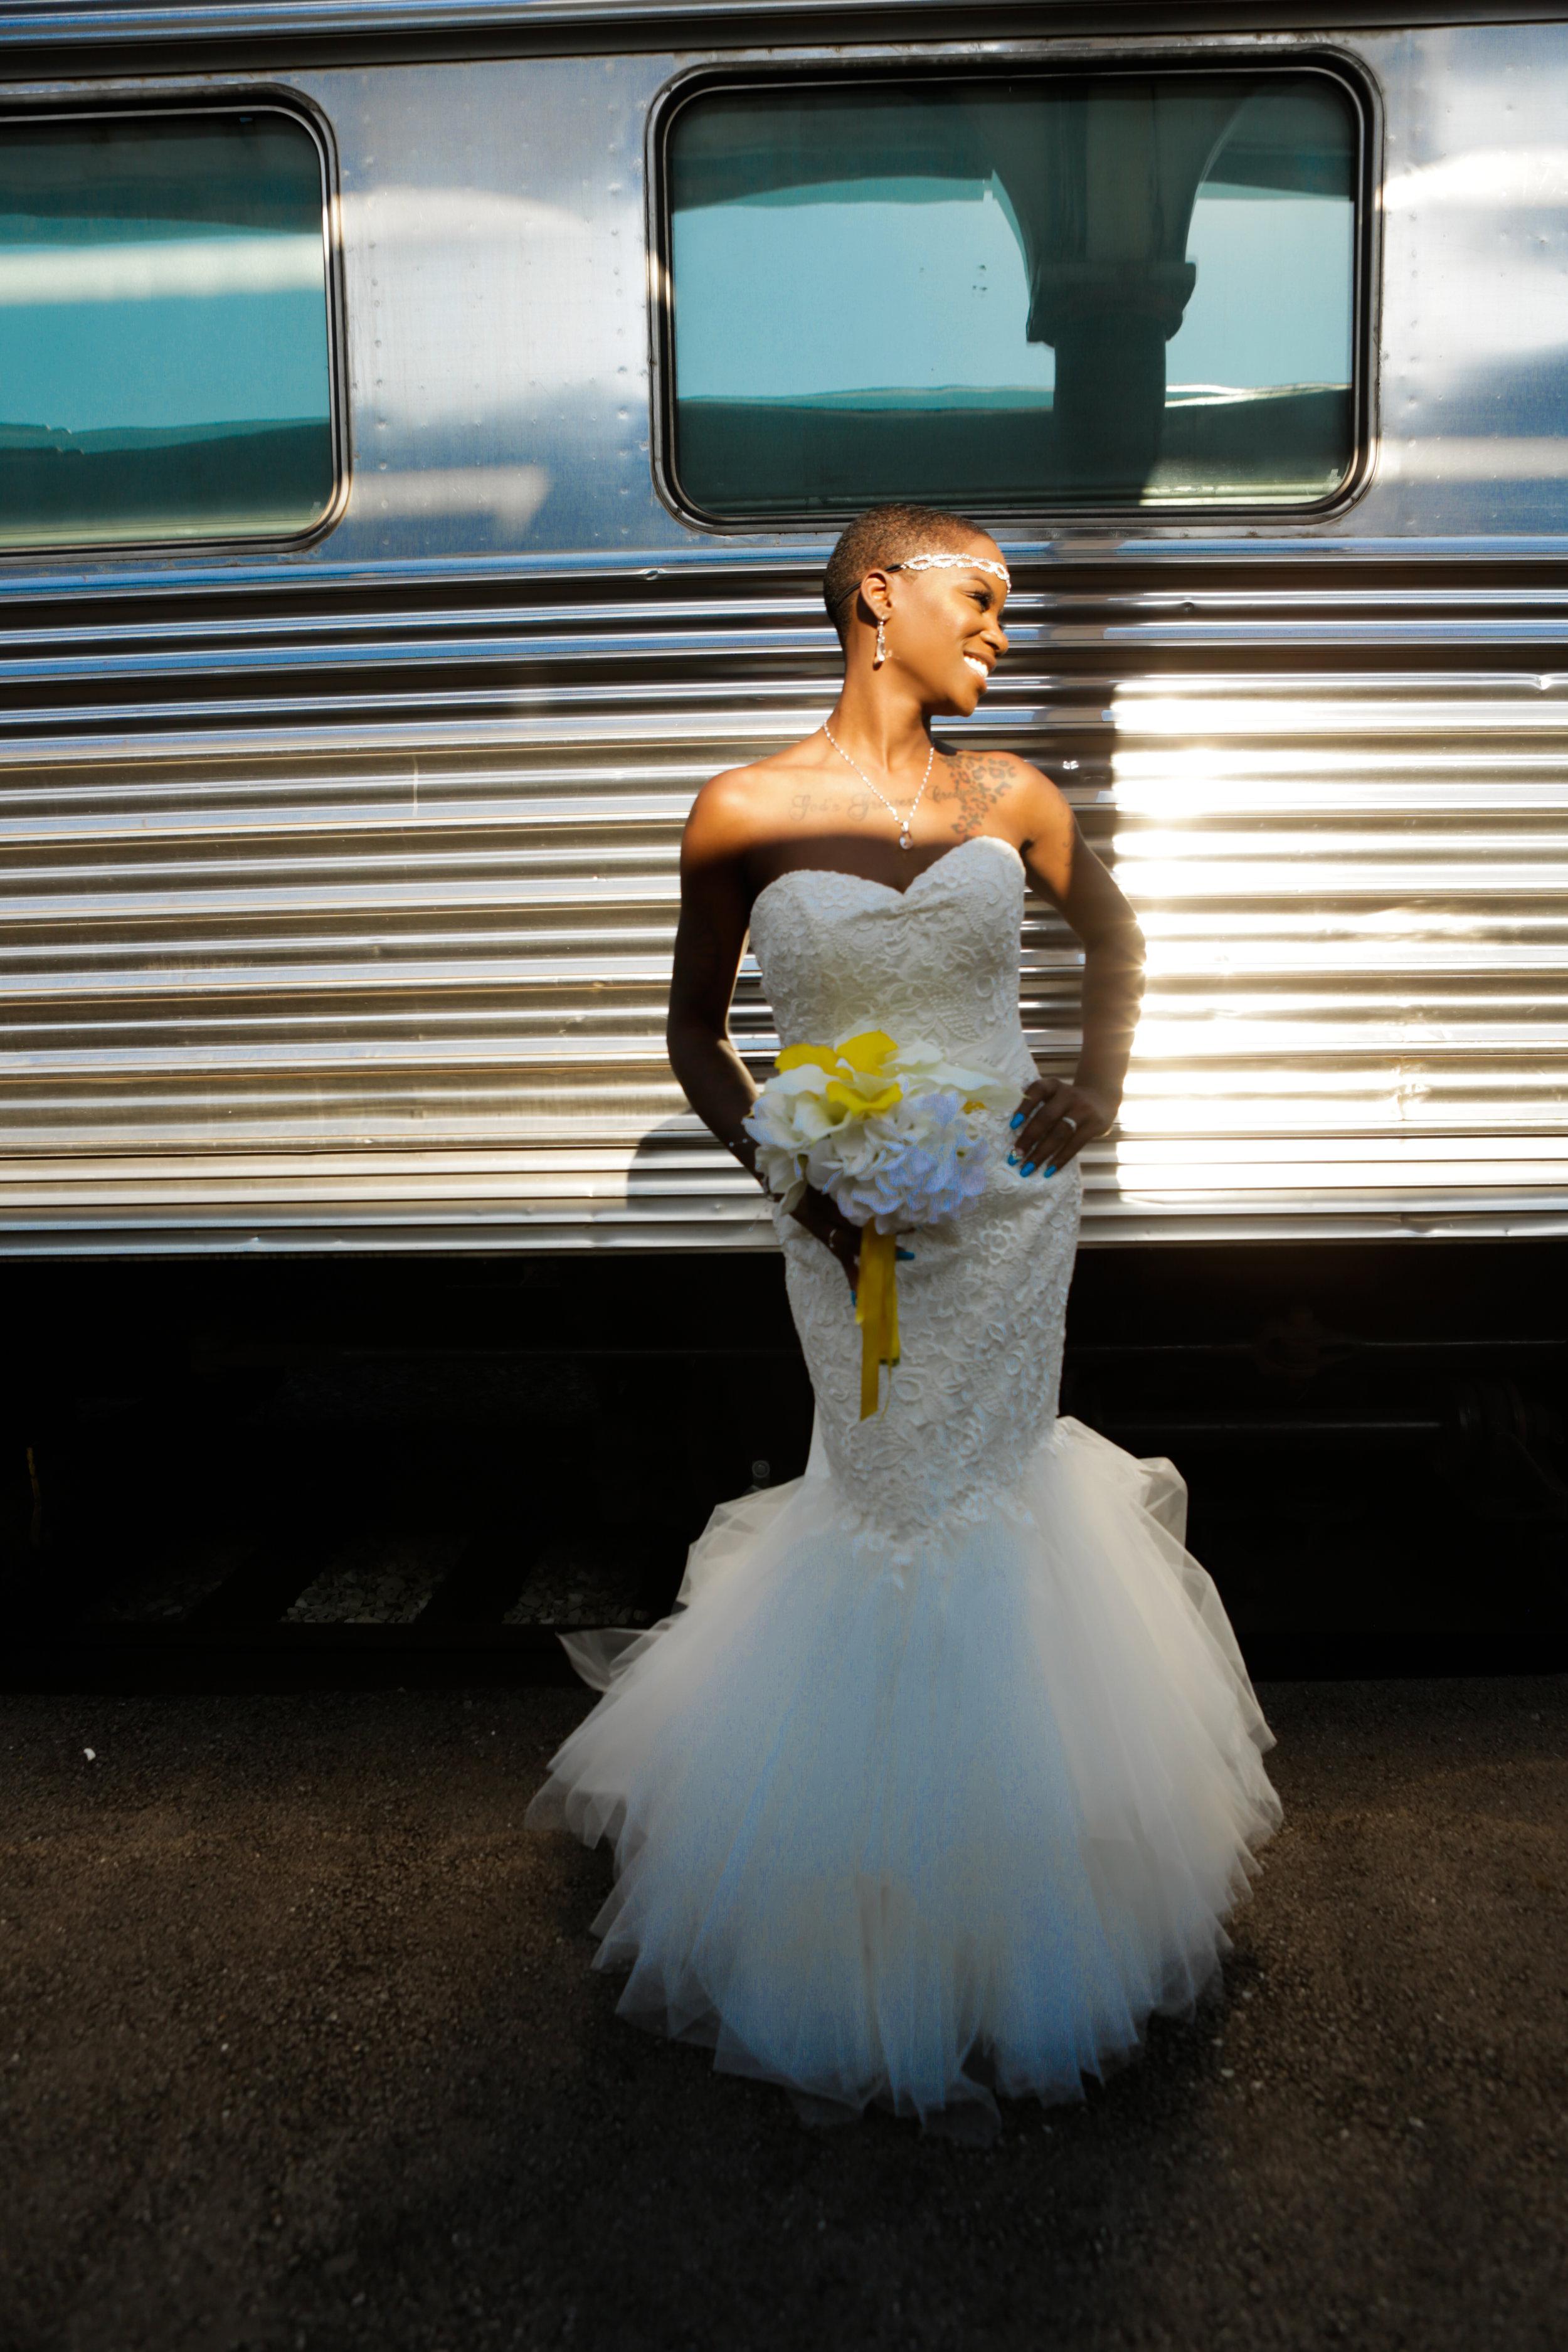 St. Louis Photographer St. Charles Photographer Engagement Wedding Photographer (9).jpg